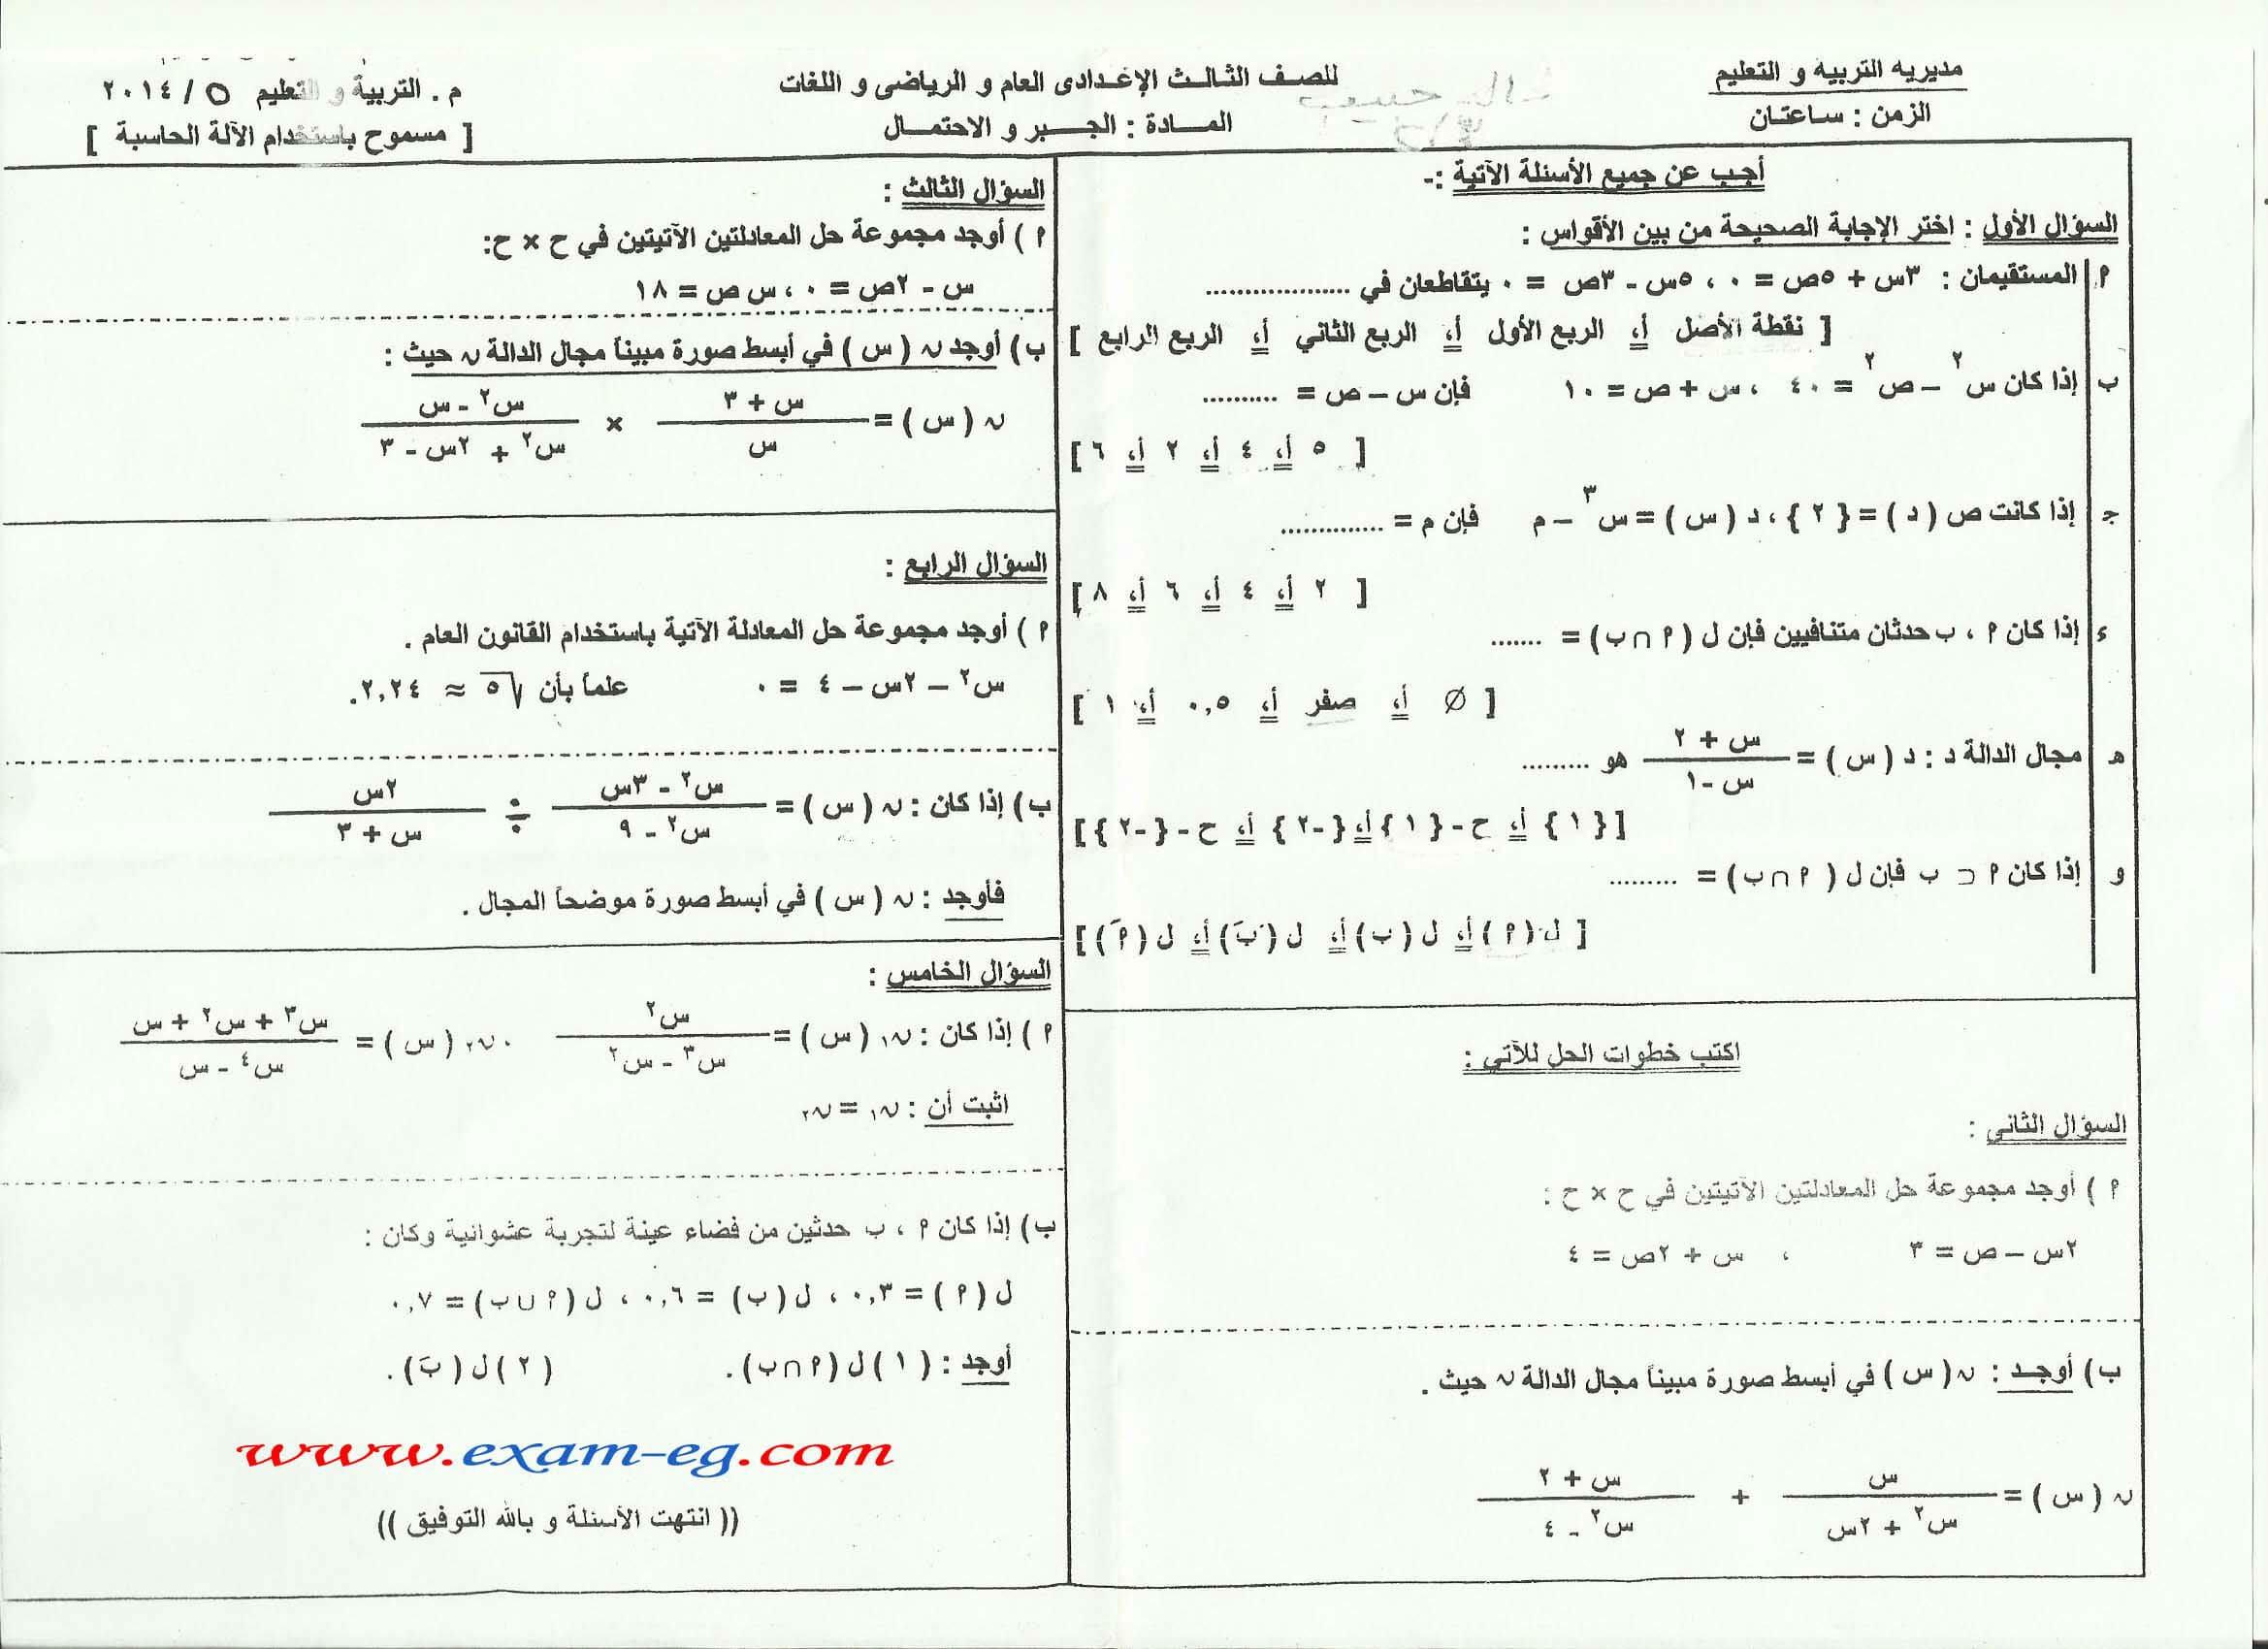 exam-eg.com_1400189523961.jpg